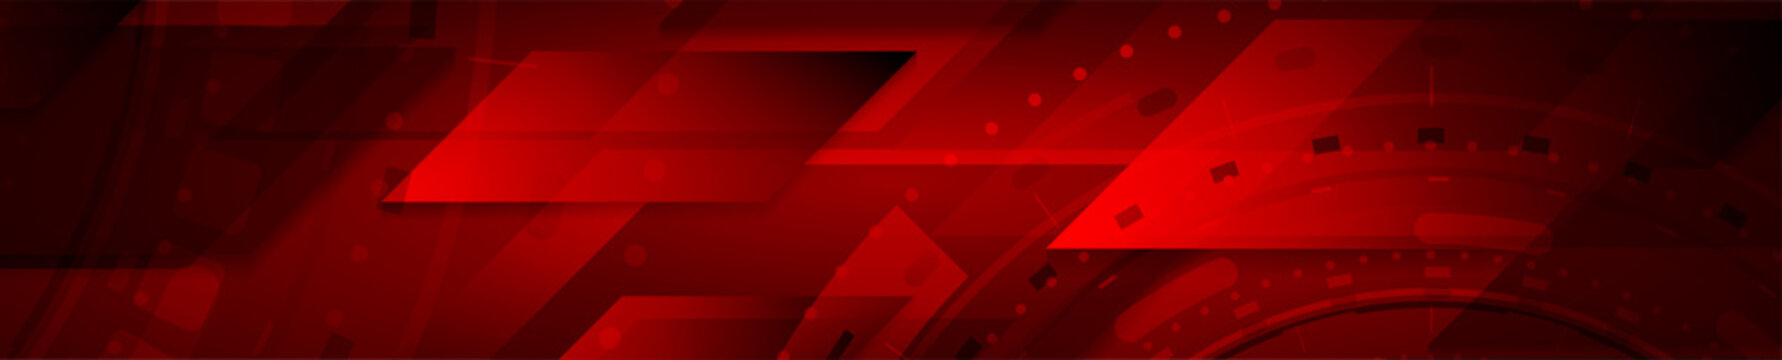 Dark red abstract technology geometric web header design. Vector background